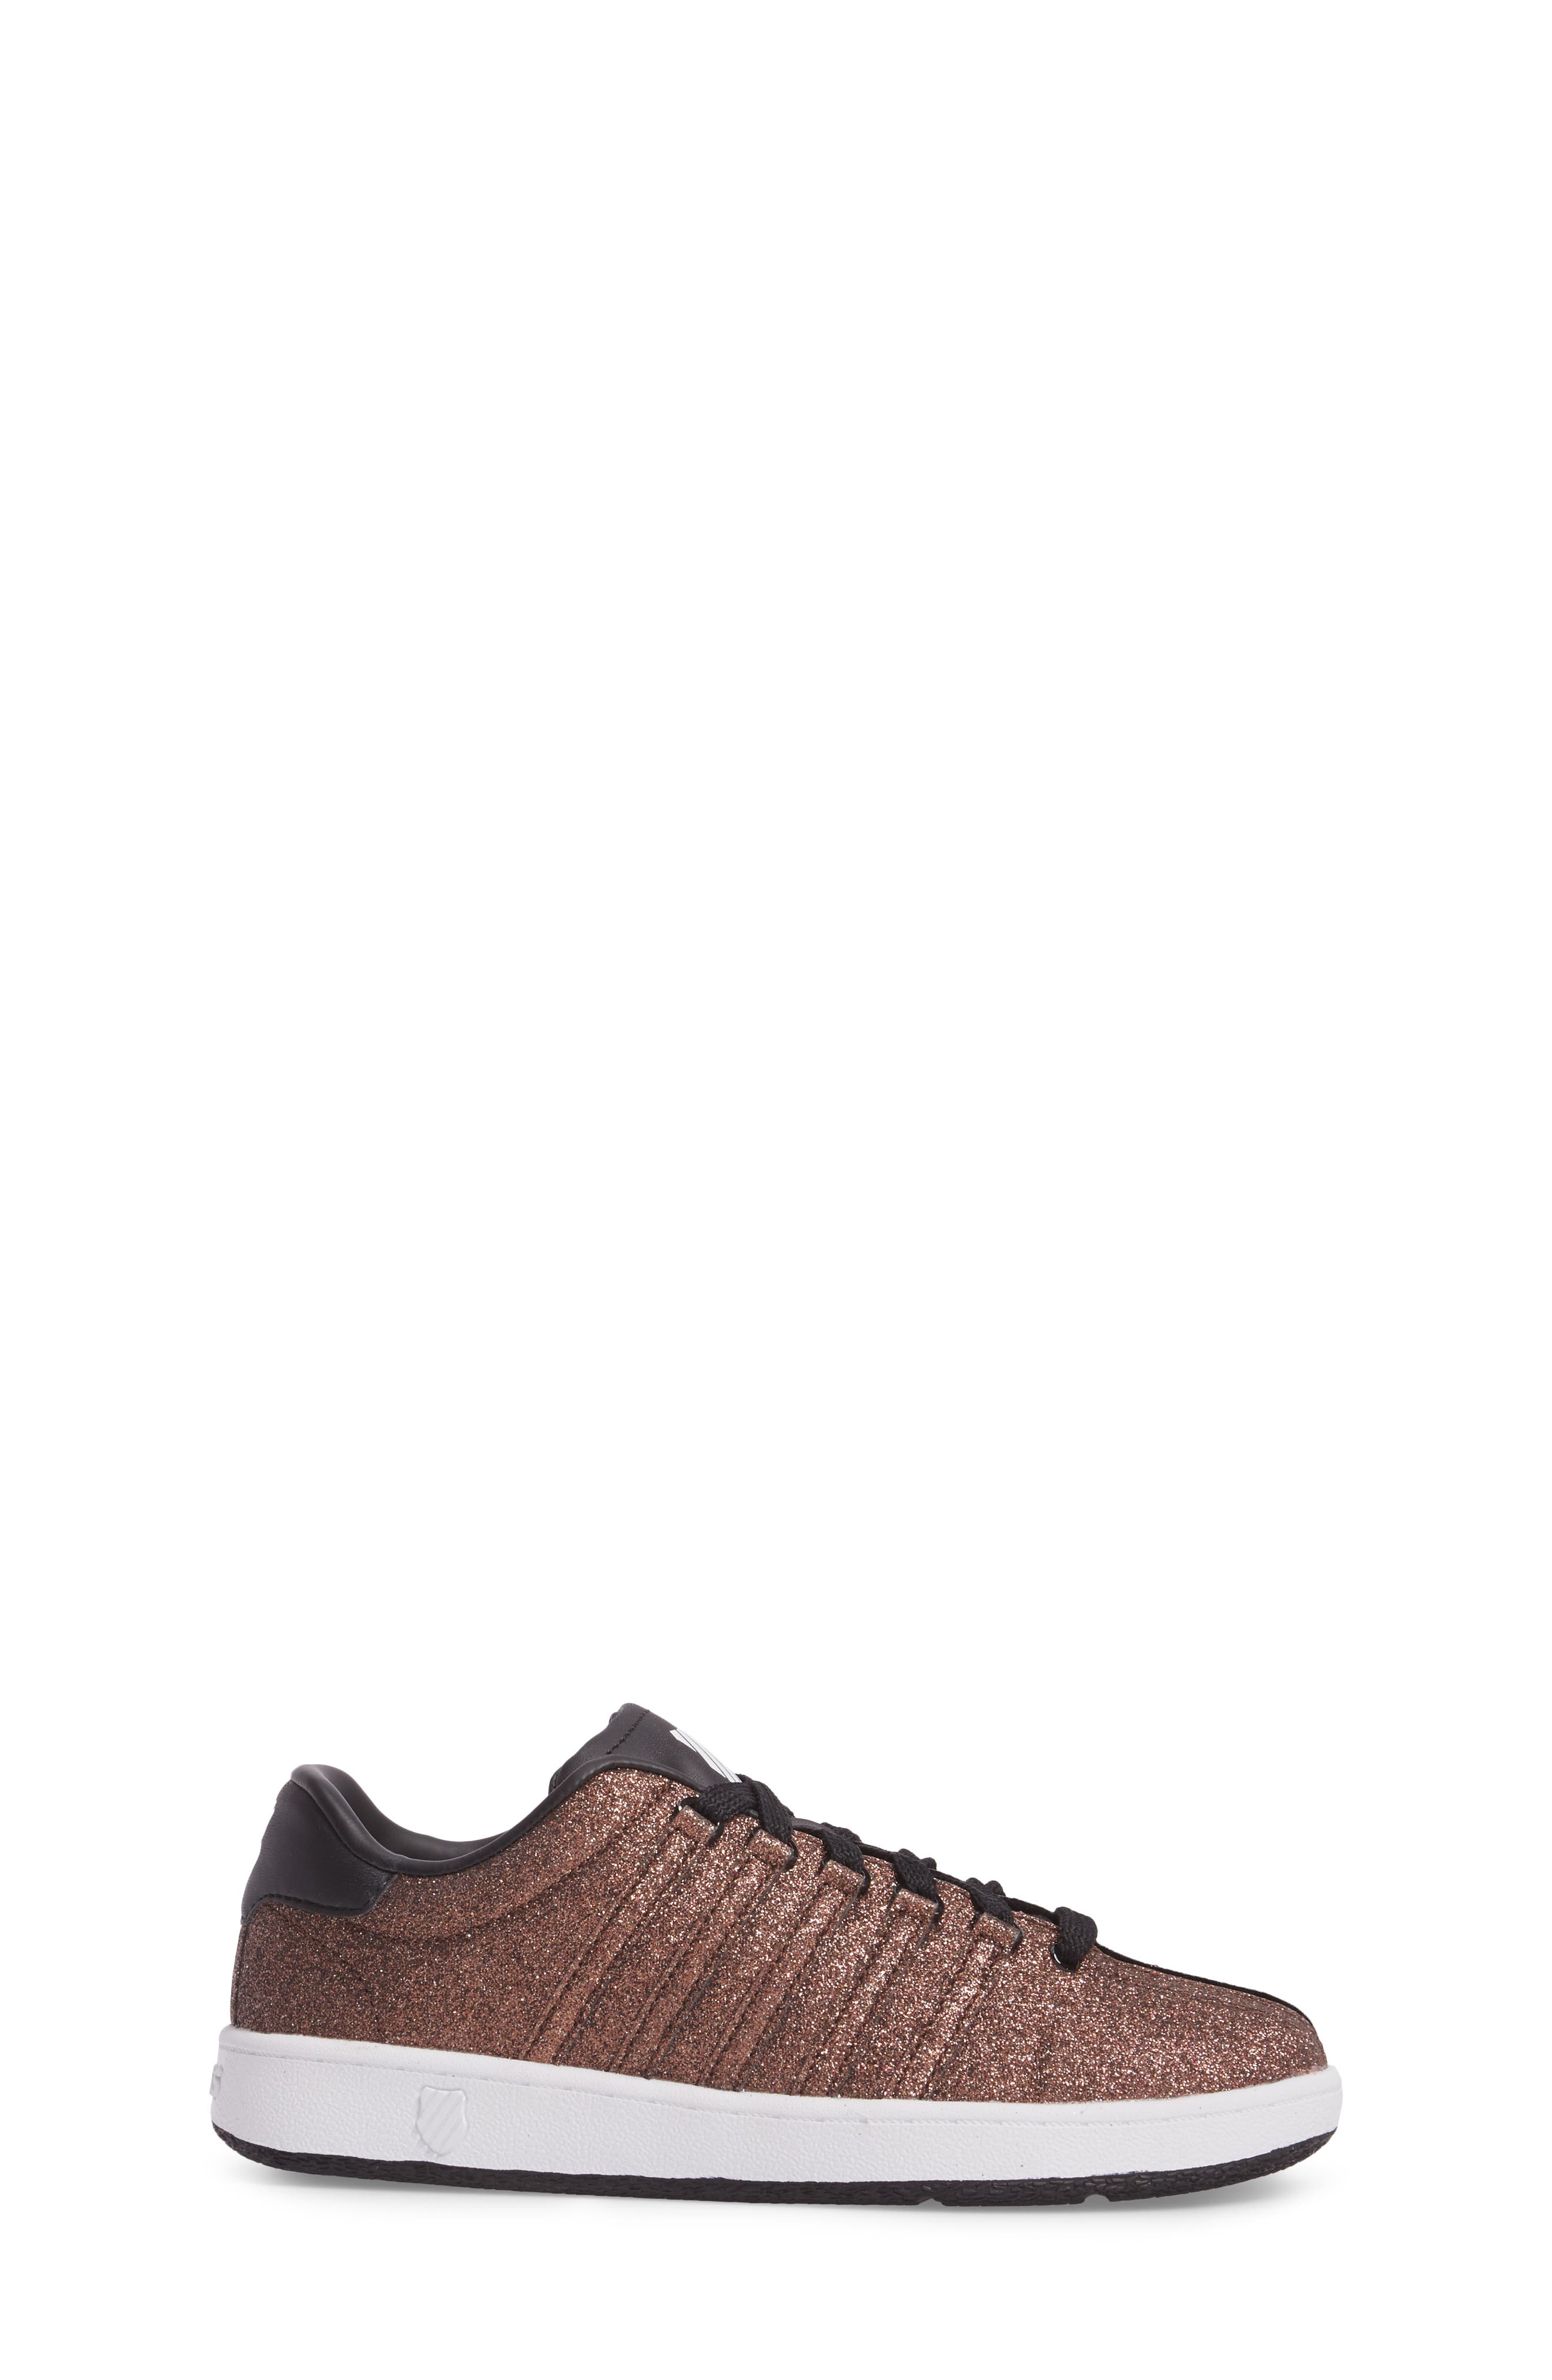 Alternate Image 3  - K-Swiss Classic VN Sparkle Low Top Sneaker (Baby, Walker, Toddler, Little Kid & Big Kid)